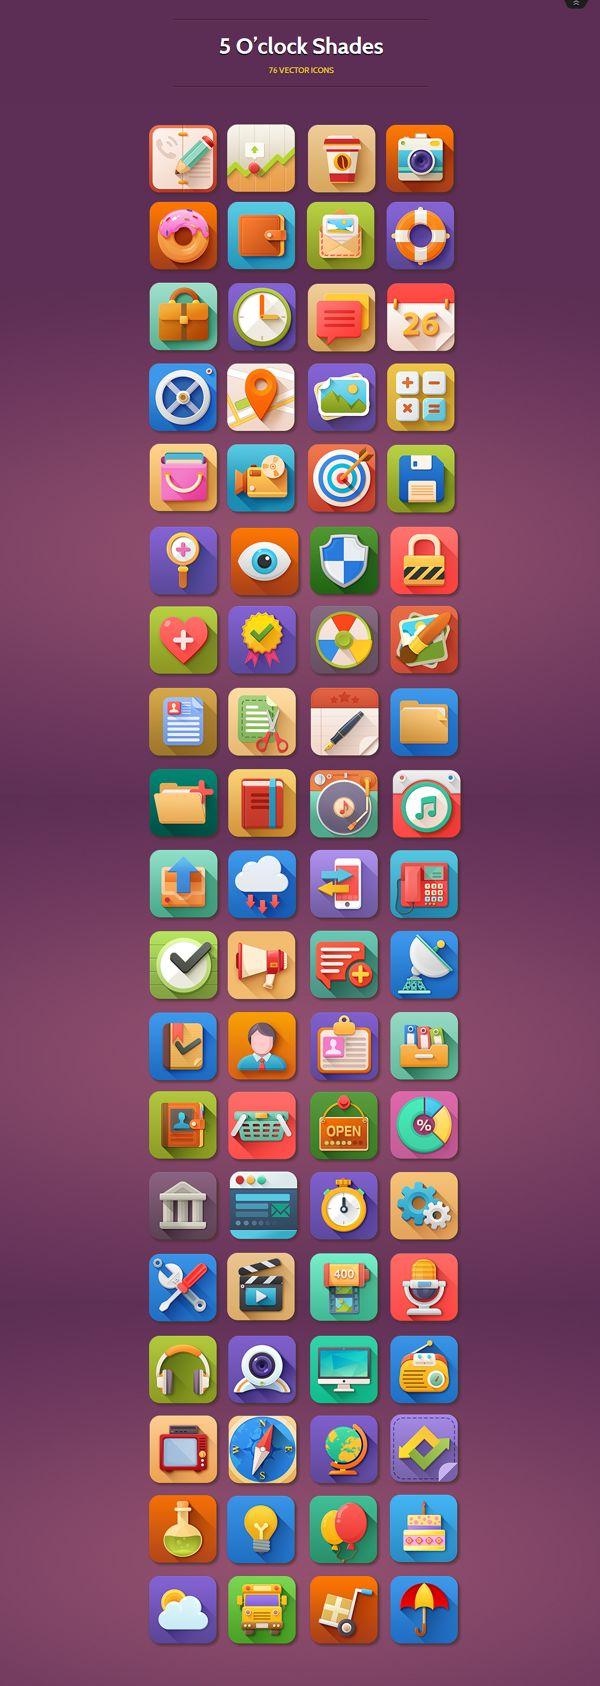 5 O'clock Shades Icon Set by WordPress Awards , via Behance flat gradient UI